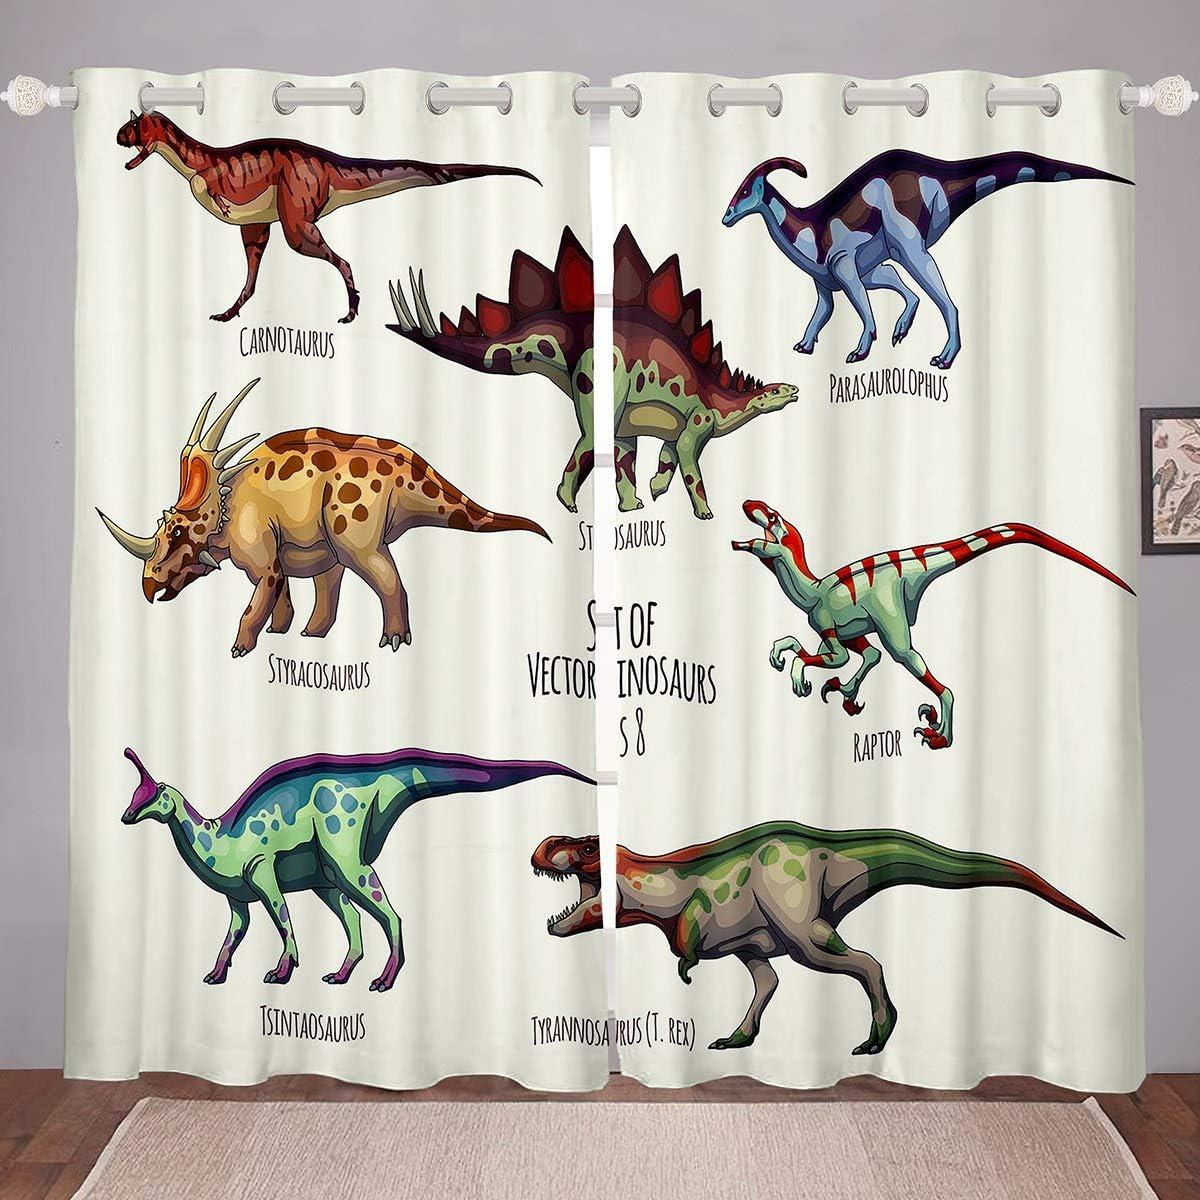 Feelyou Cartoon Dinosaur Over Selling item handling ☆ Curtains Livi Dino Bedroom for